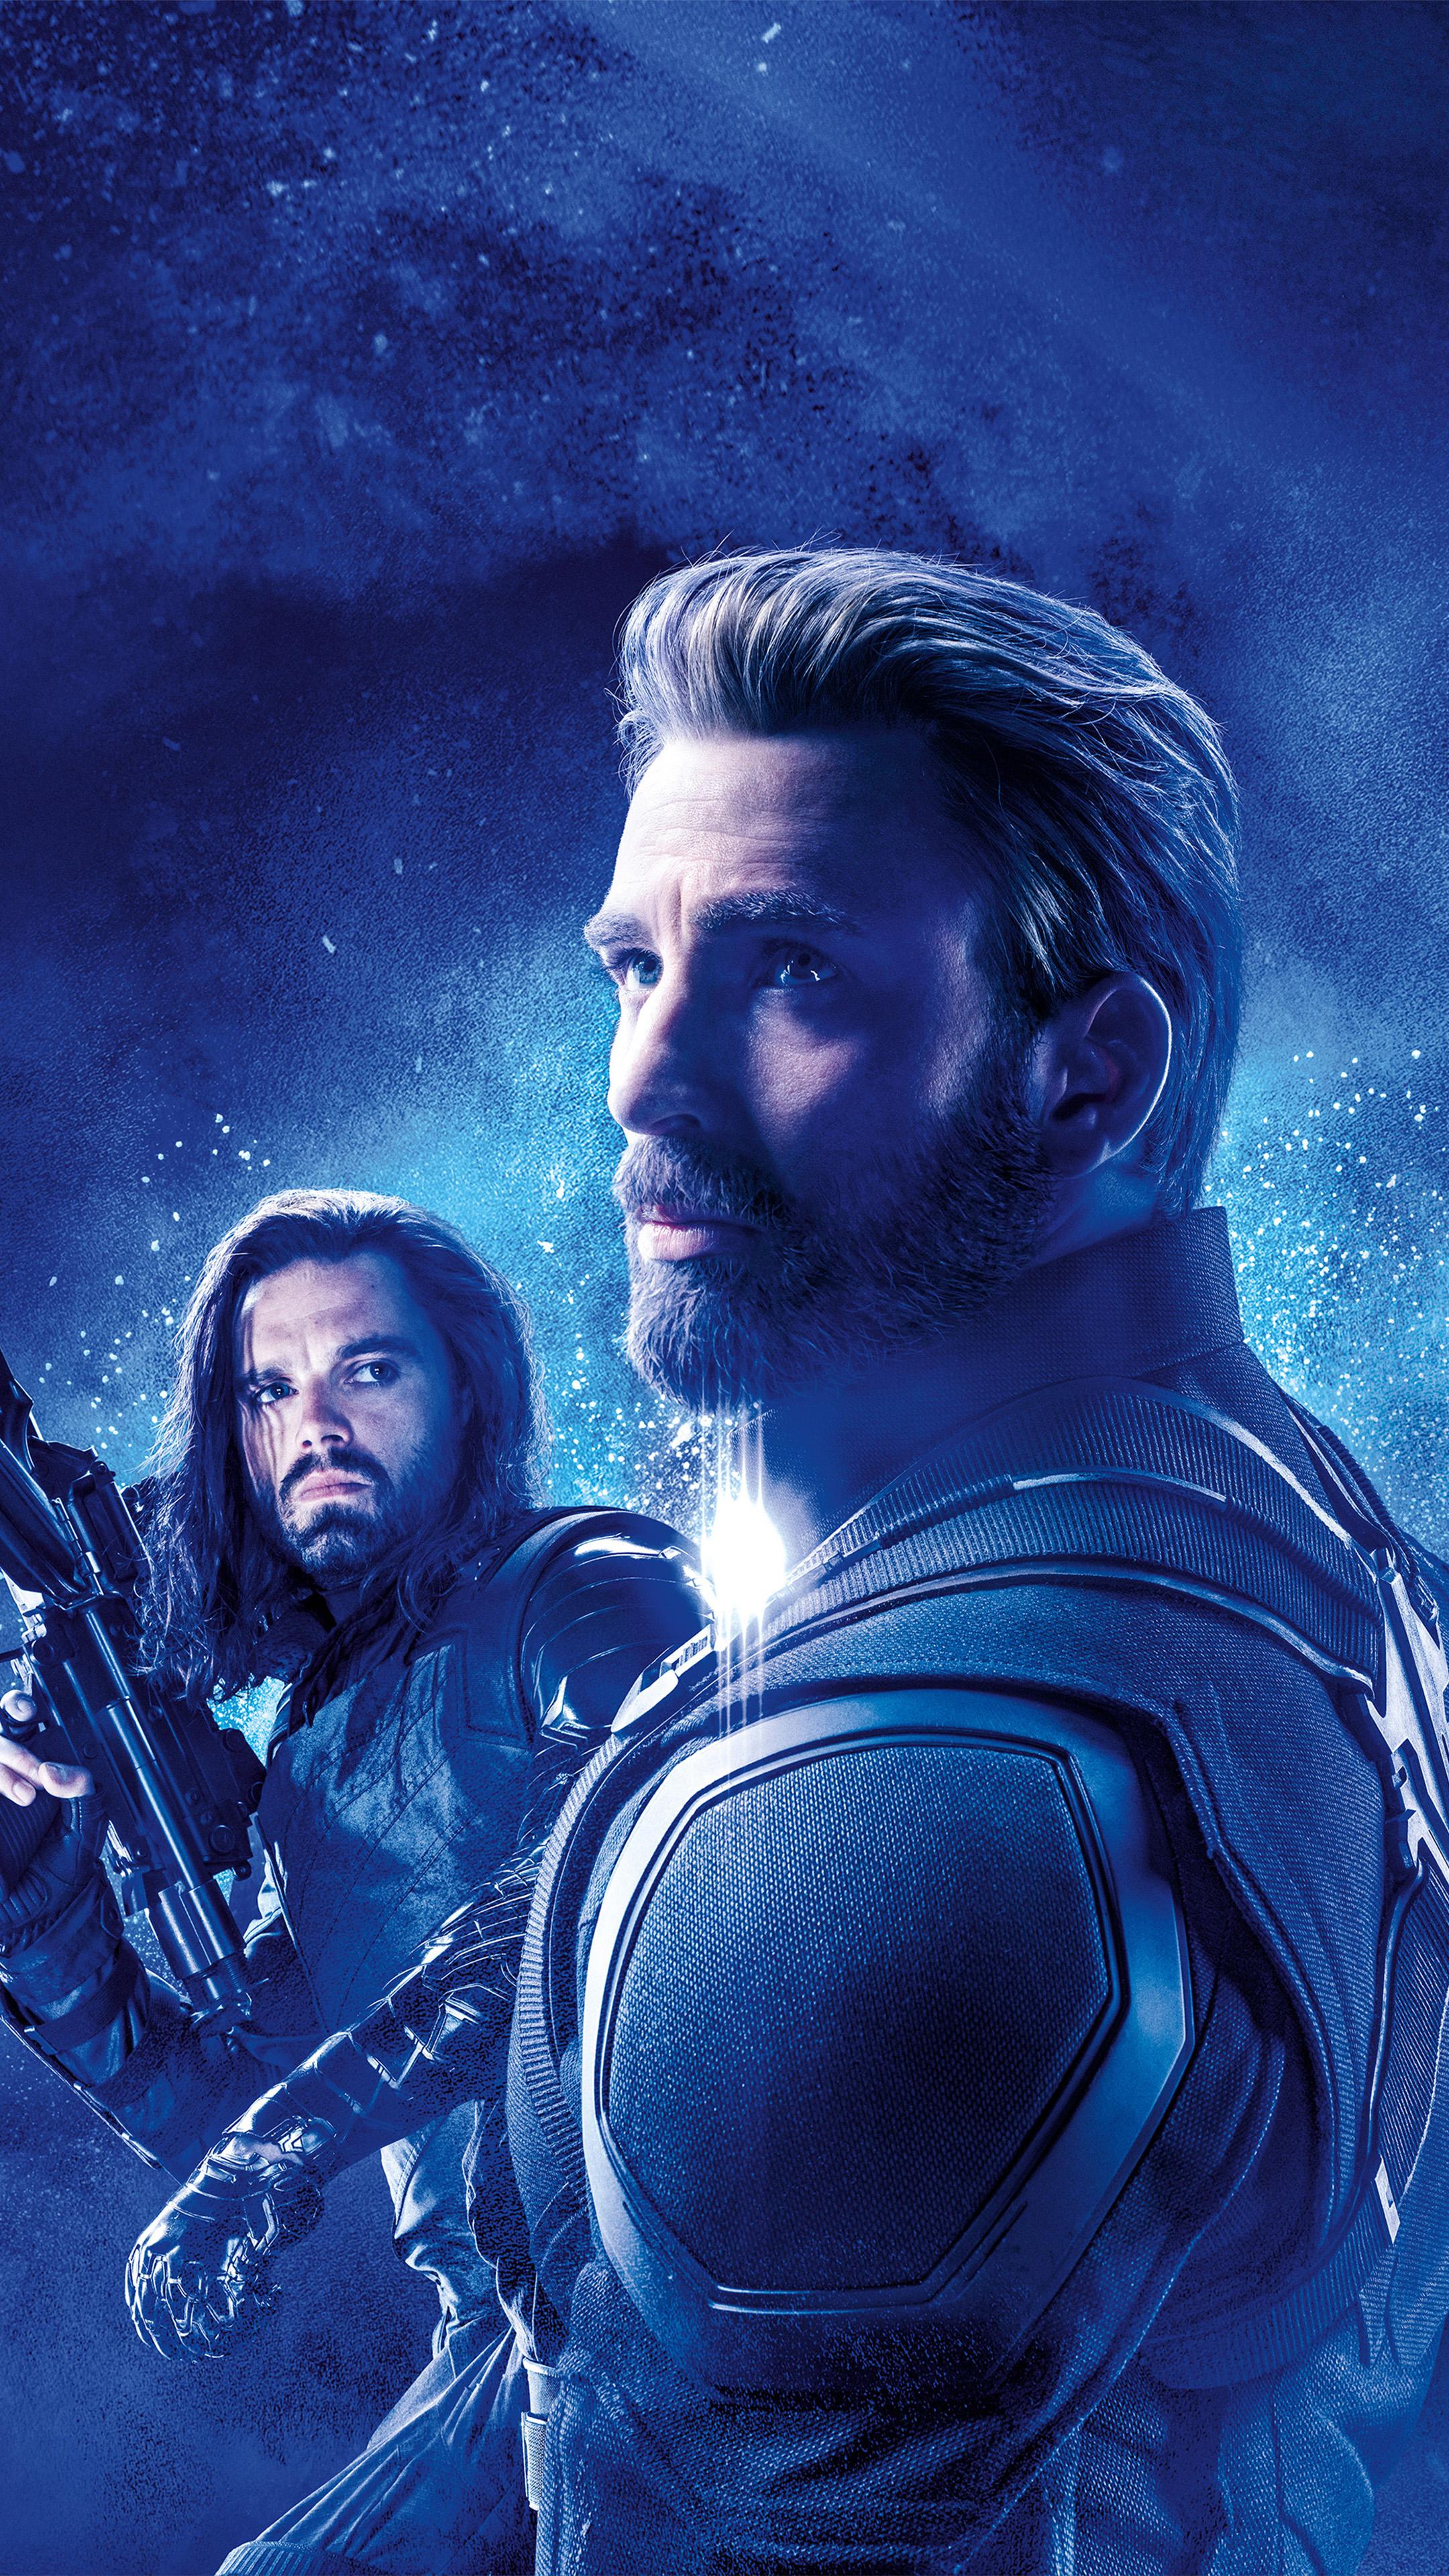 Free Download Download Captain America Bucky Barnes In Avengers